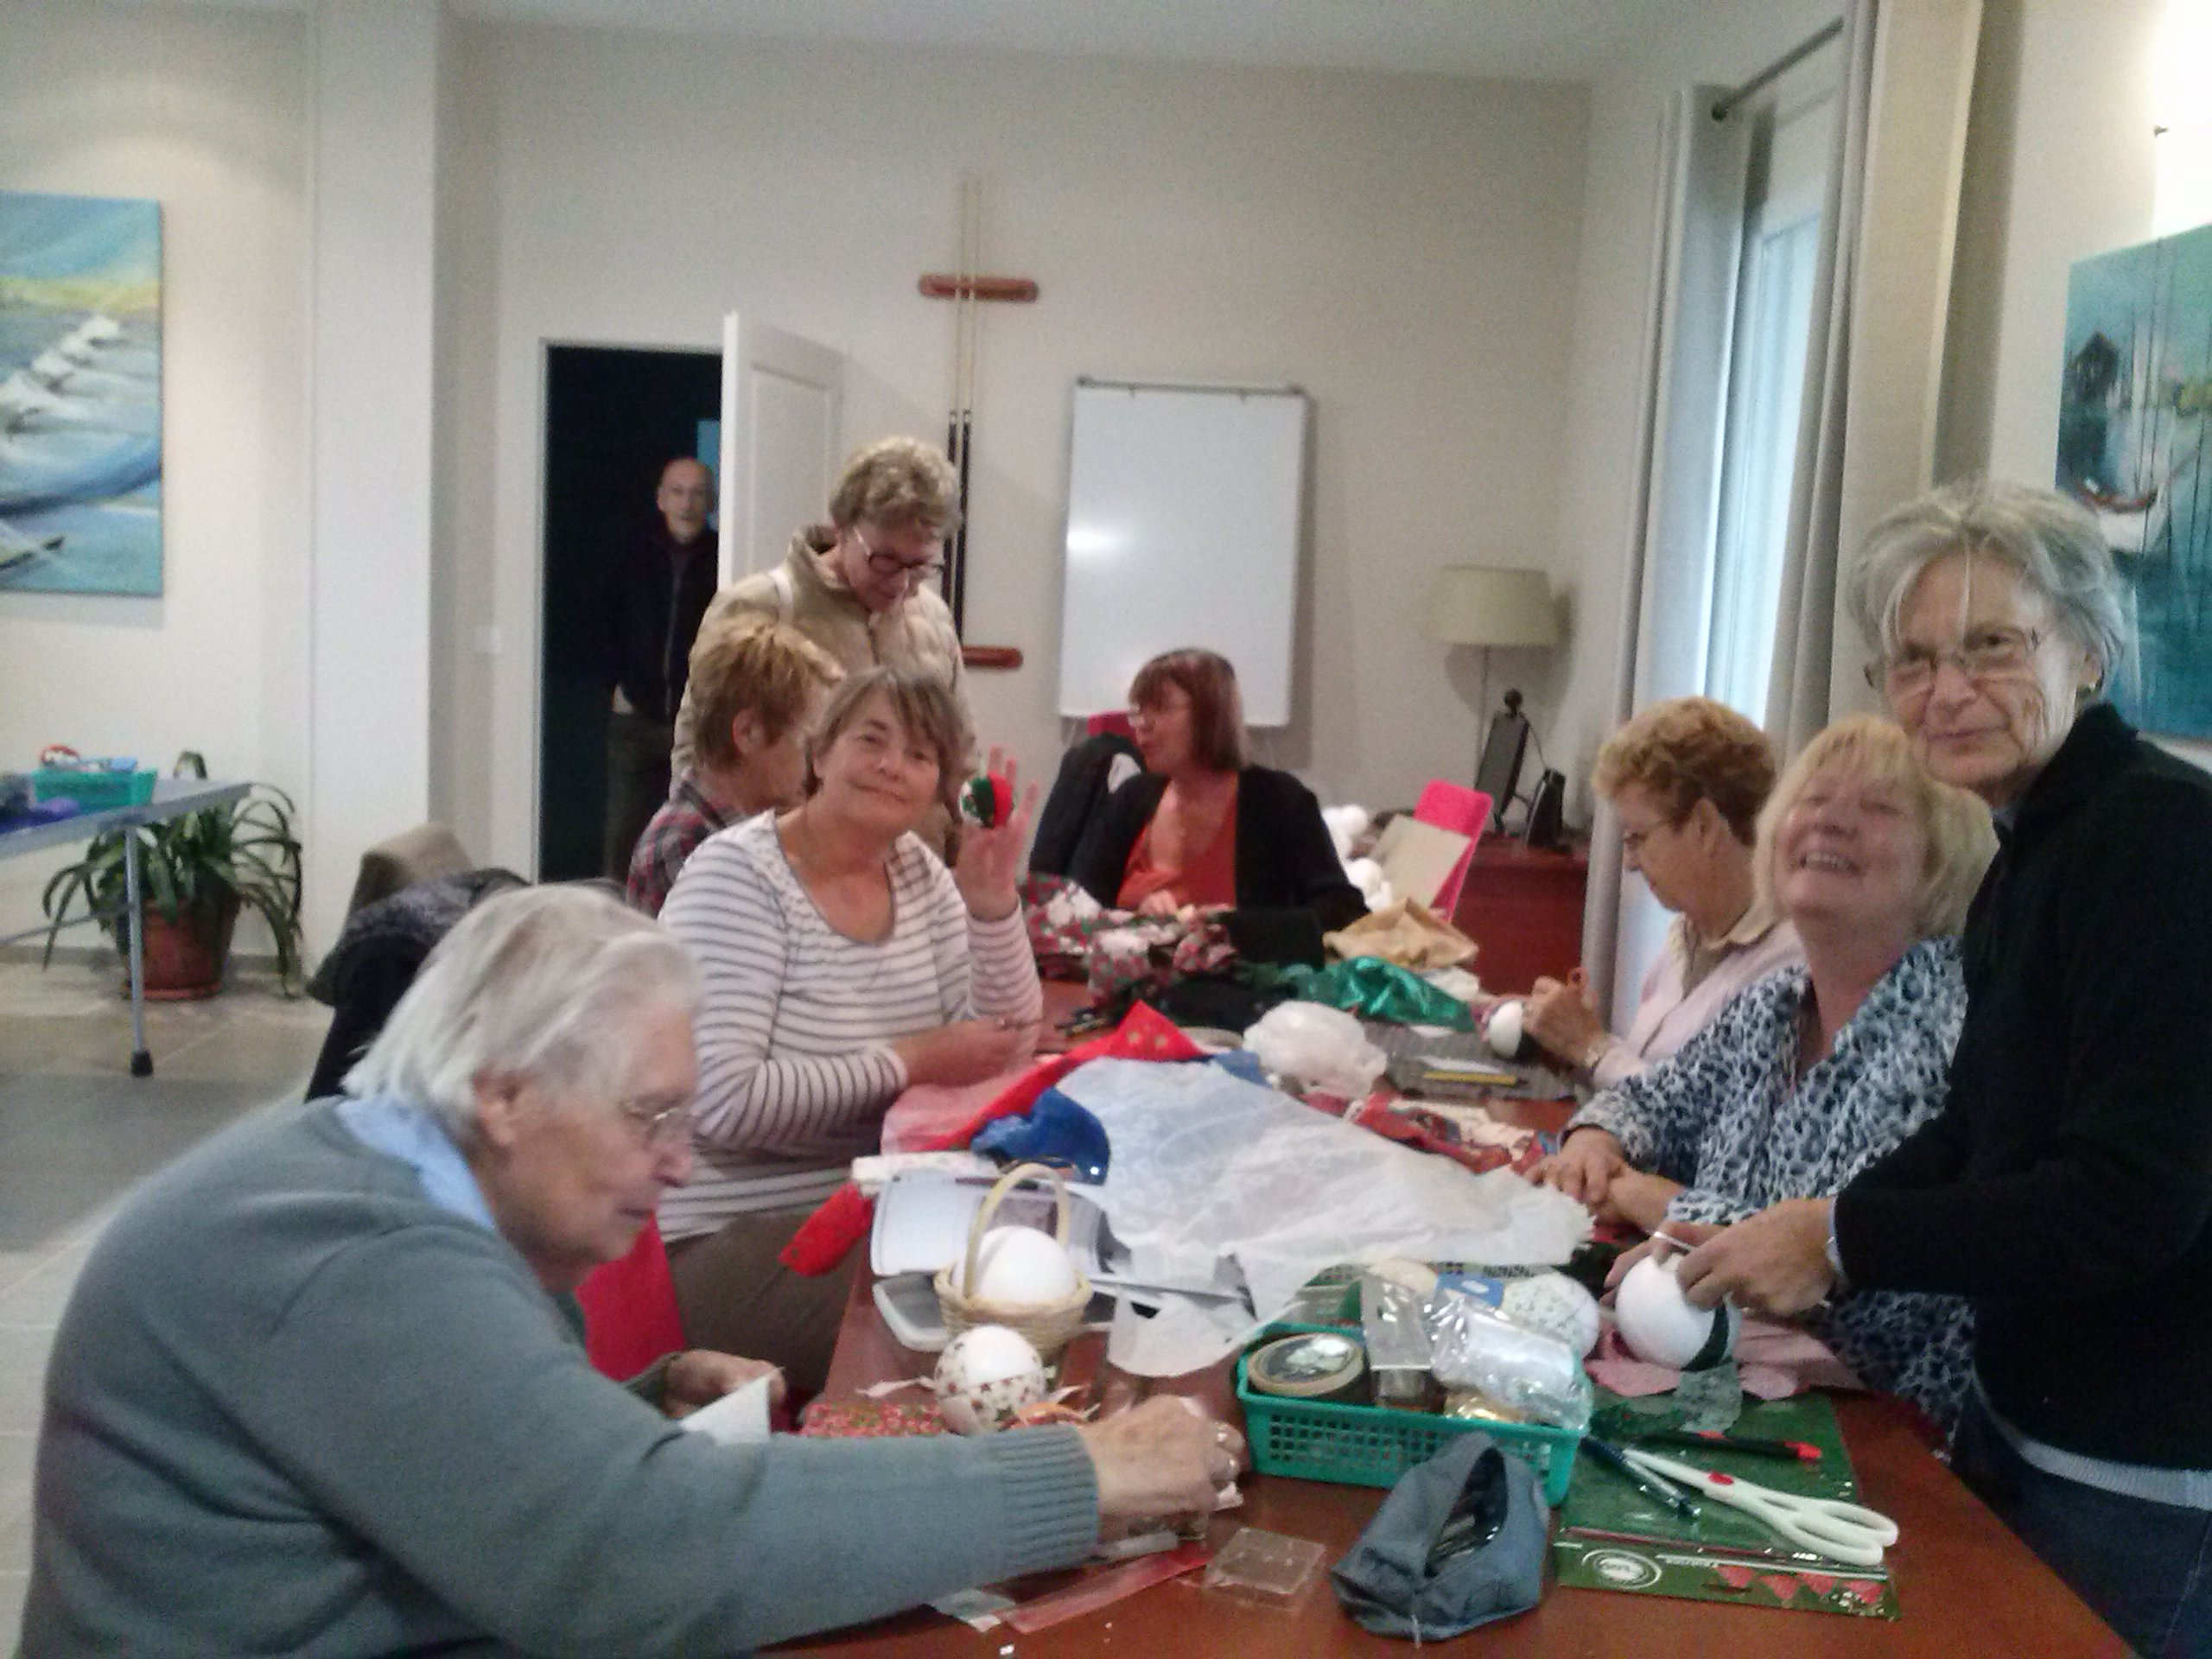 Fabrication des d corations de noel blog senioriales - Fabrication de decoration de noel ...